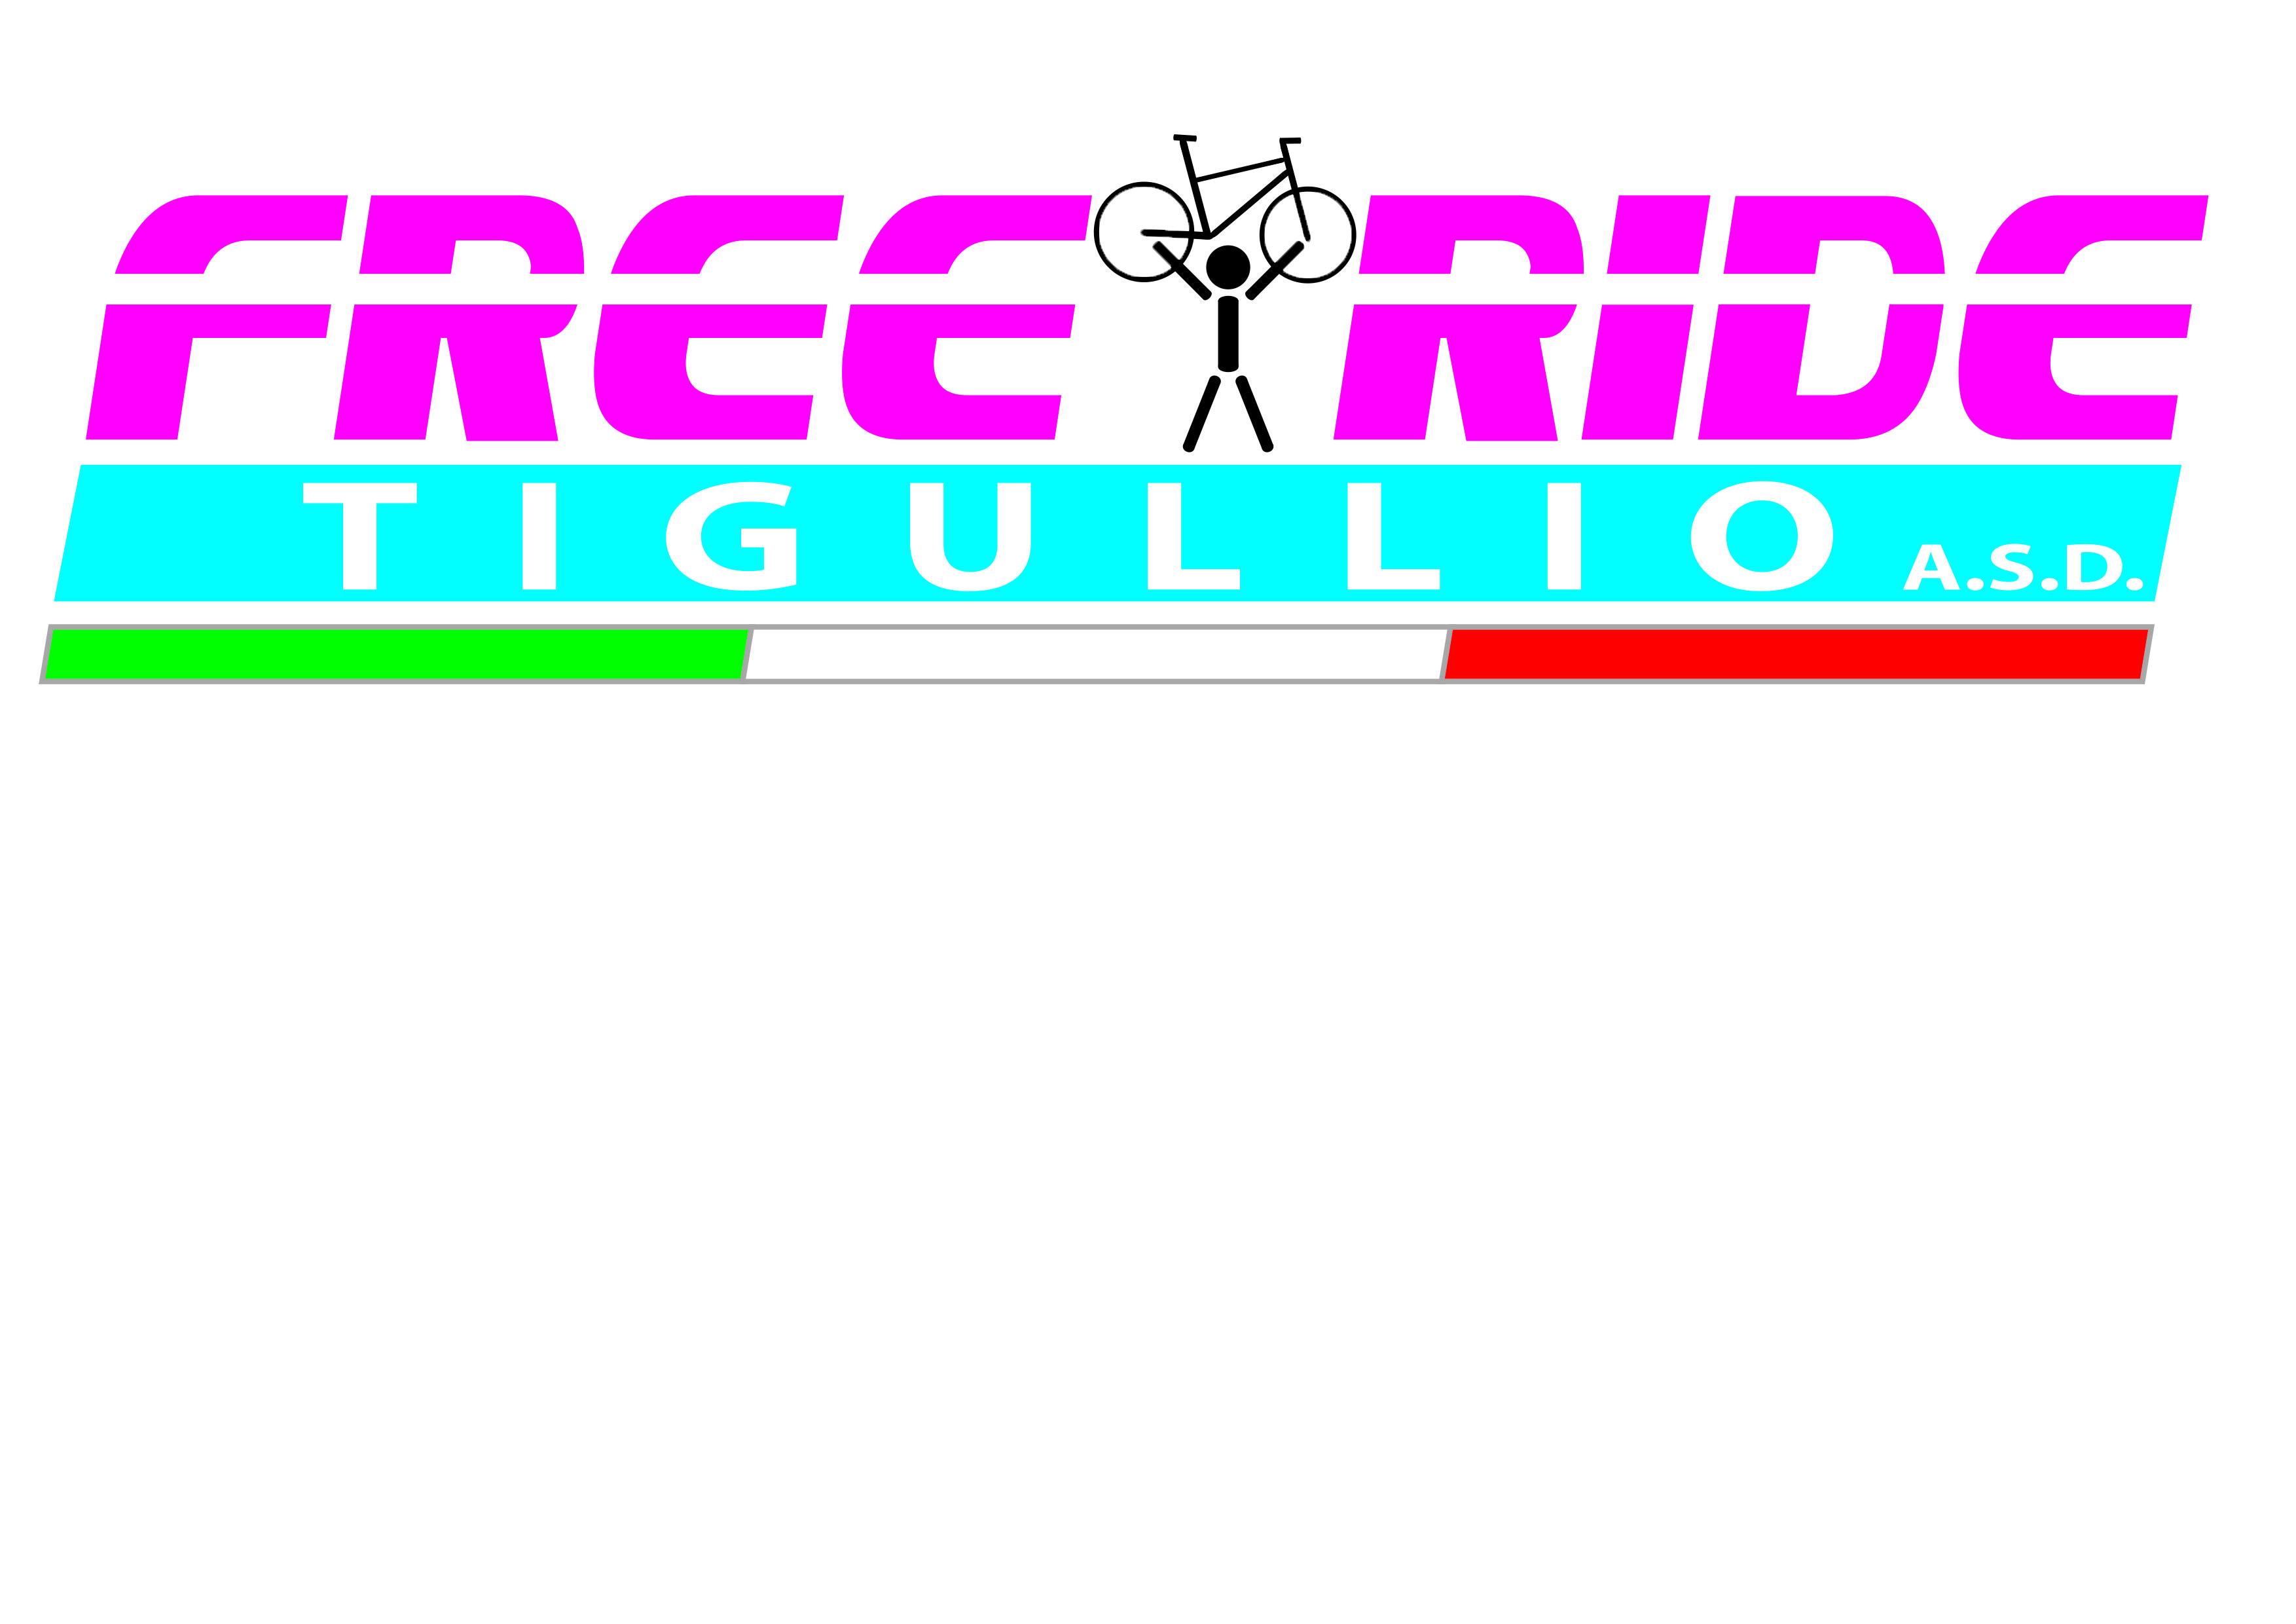 Freeride Tigullio